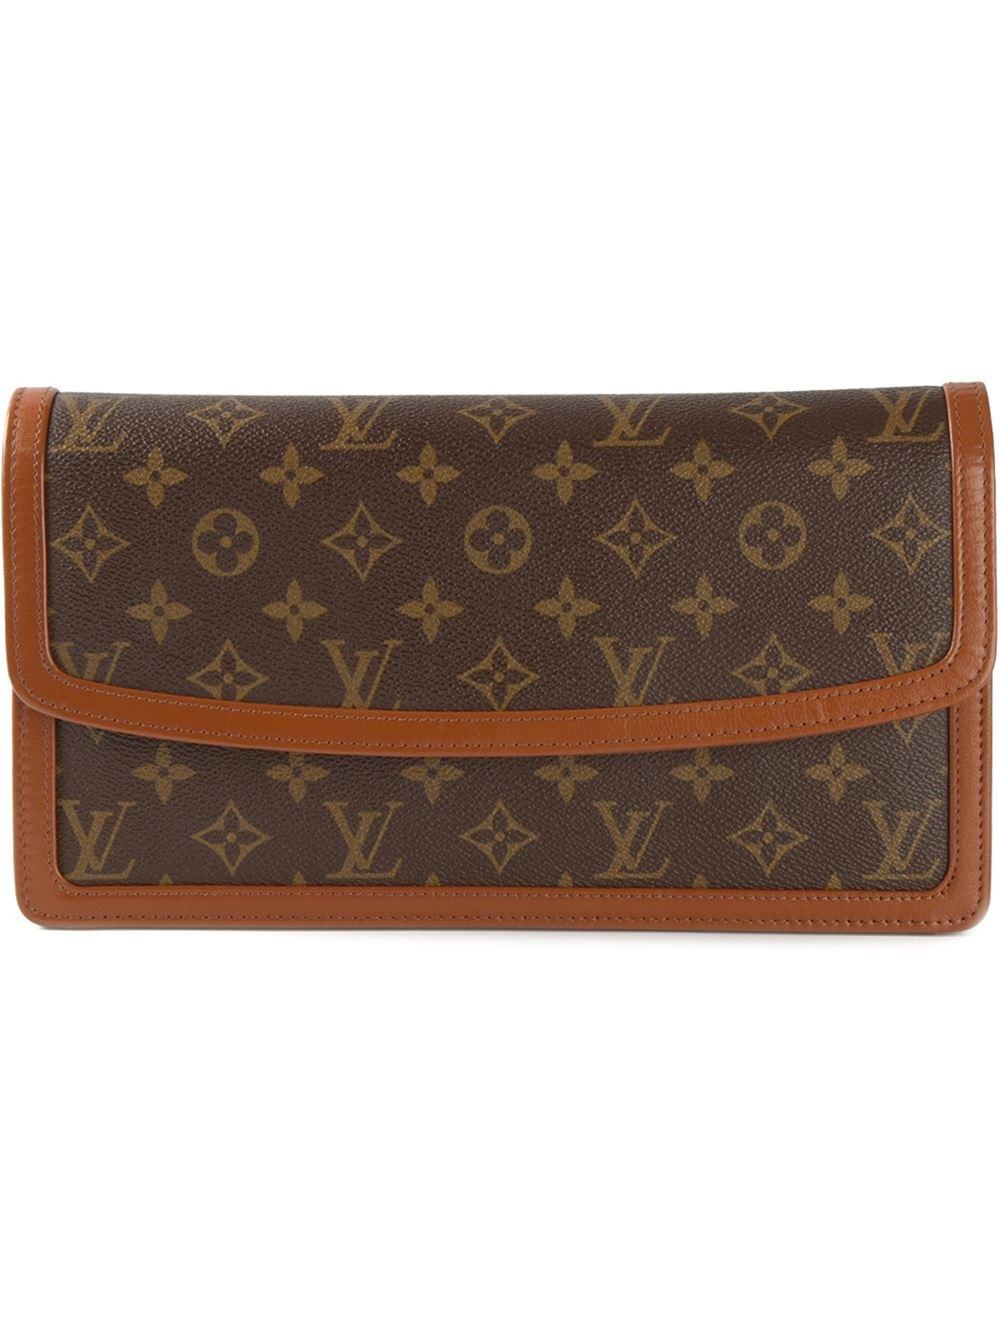 Louis Vuitton Dame Gm Clutch In Brown Lyst